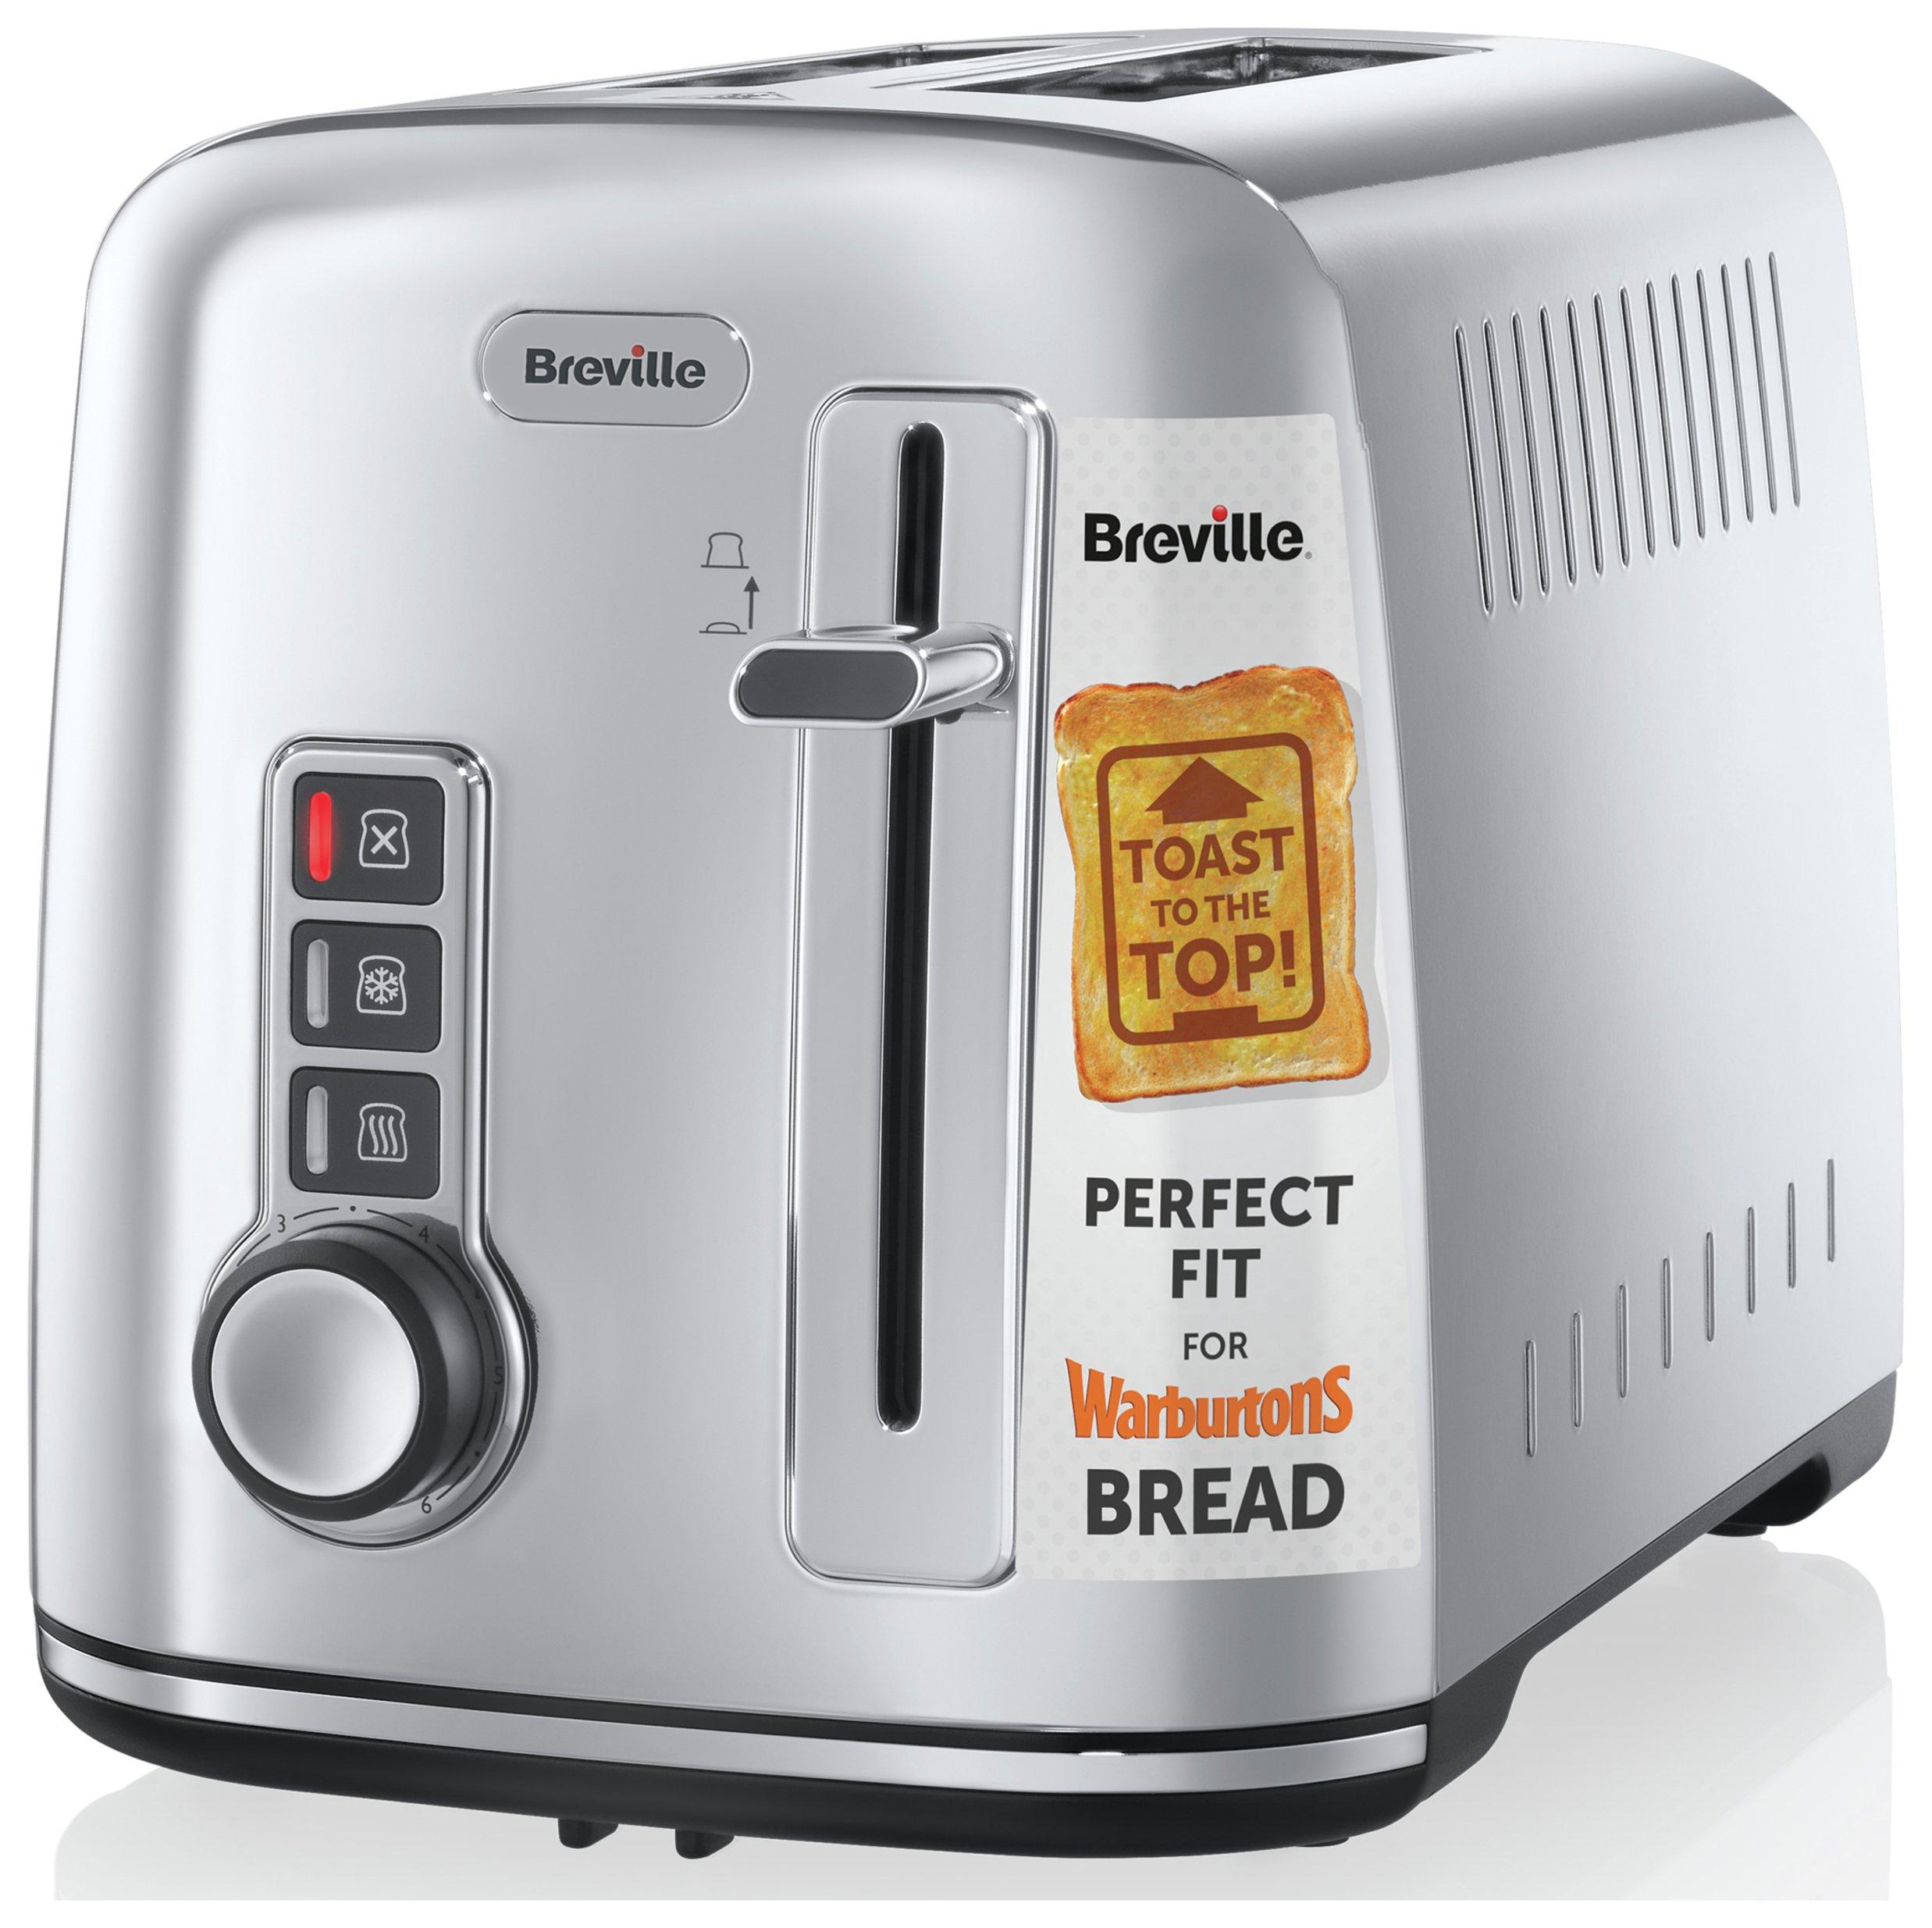 Image of Breville VTT570 Warburton 2 Slice Toaster